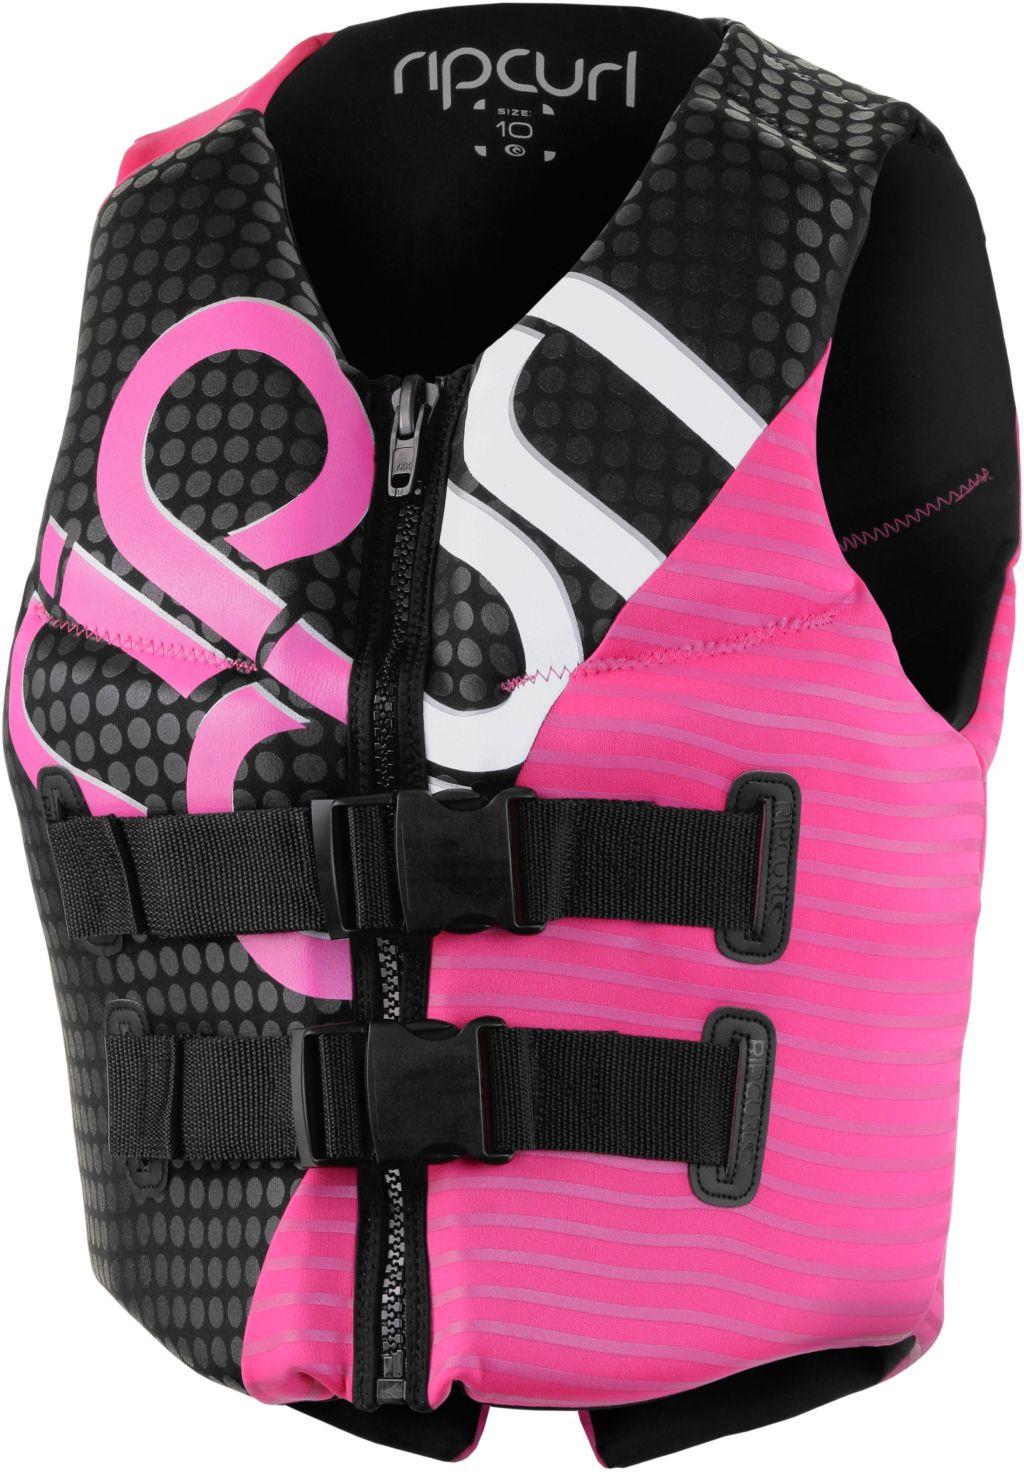 Bild Rip Curl Dawn Patrol Vest - Pink Rettungsweste Damen